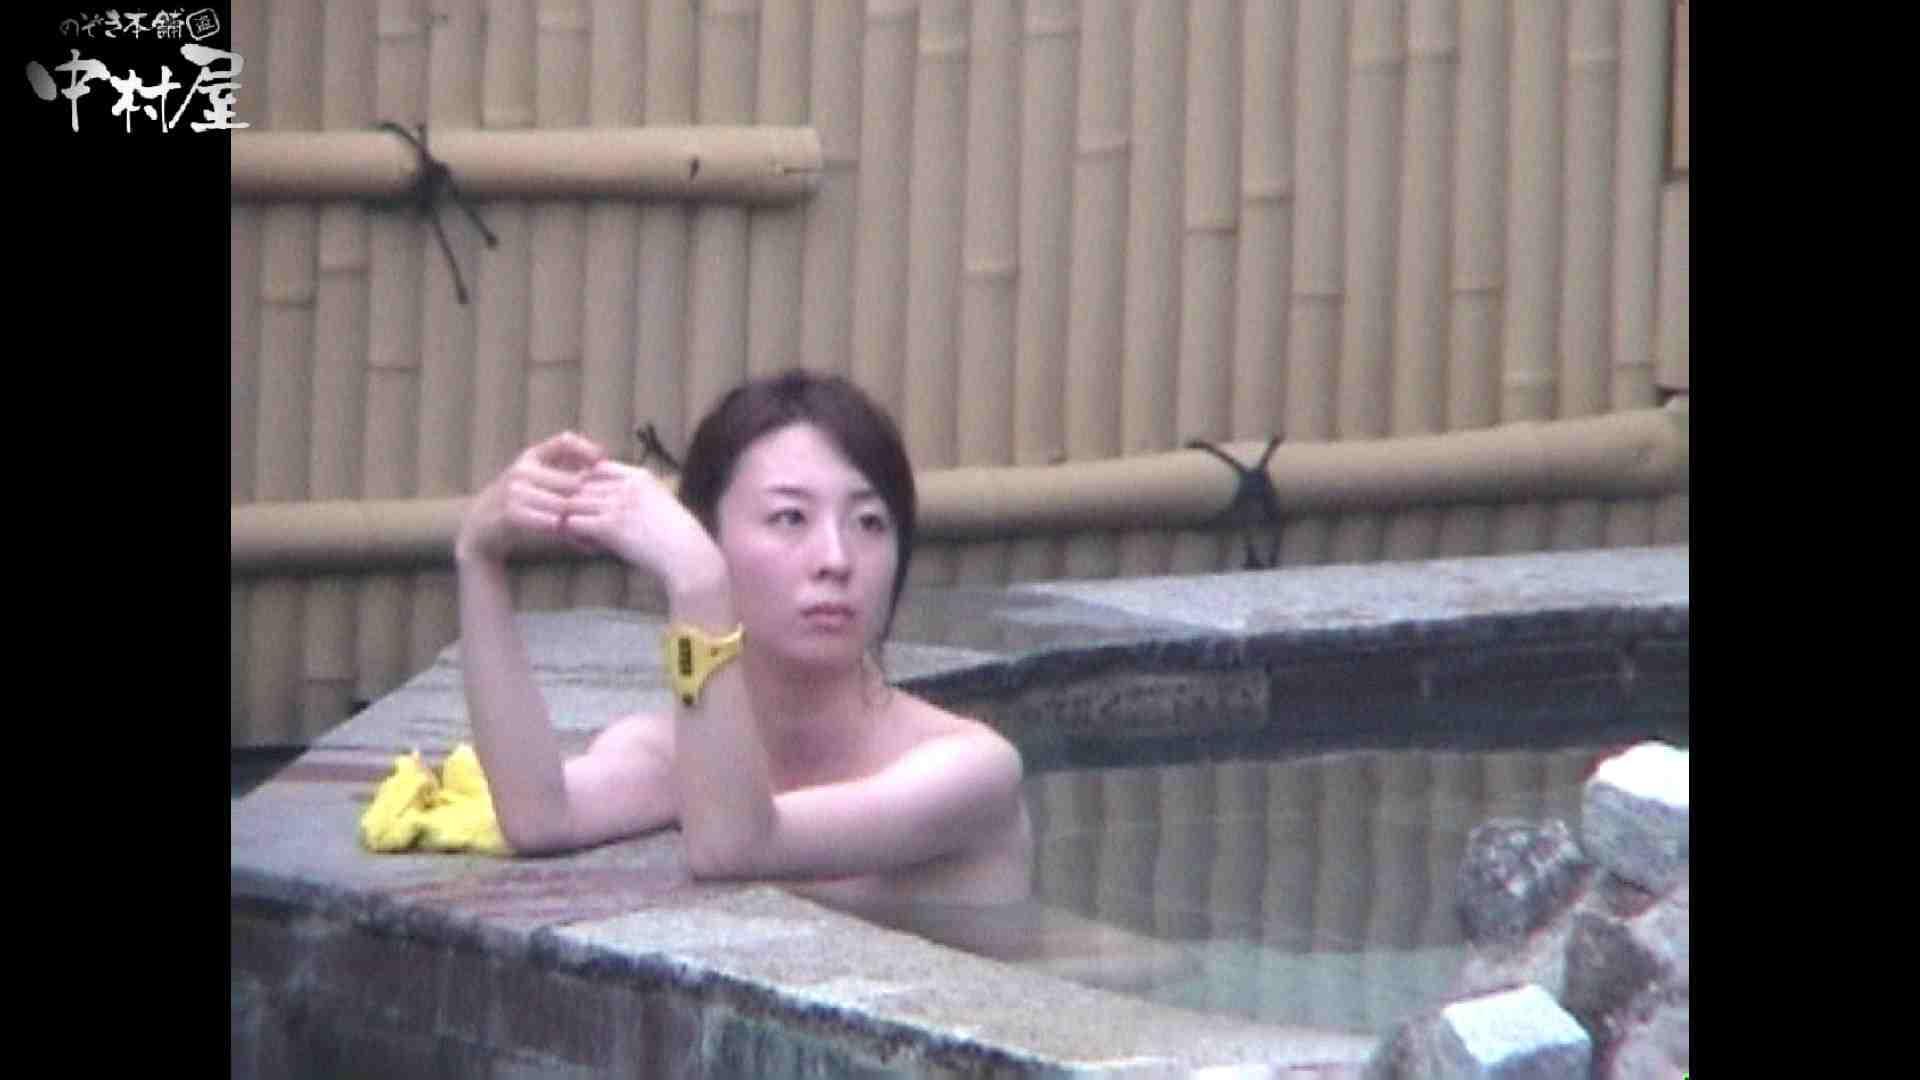 Aquaな露天風呂Vol.964 綺麗なOLたち オメコ無修正動画無料 97枚 71